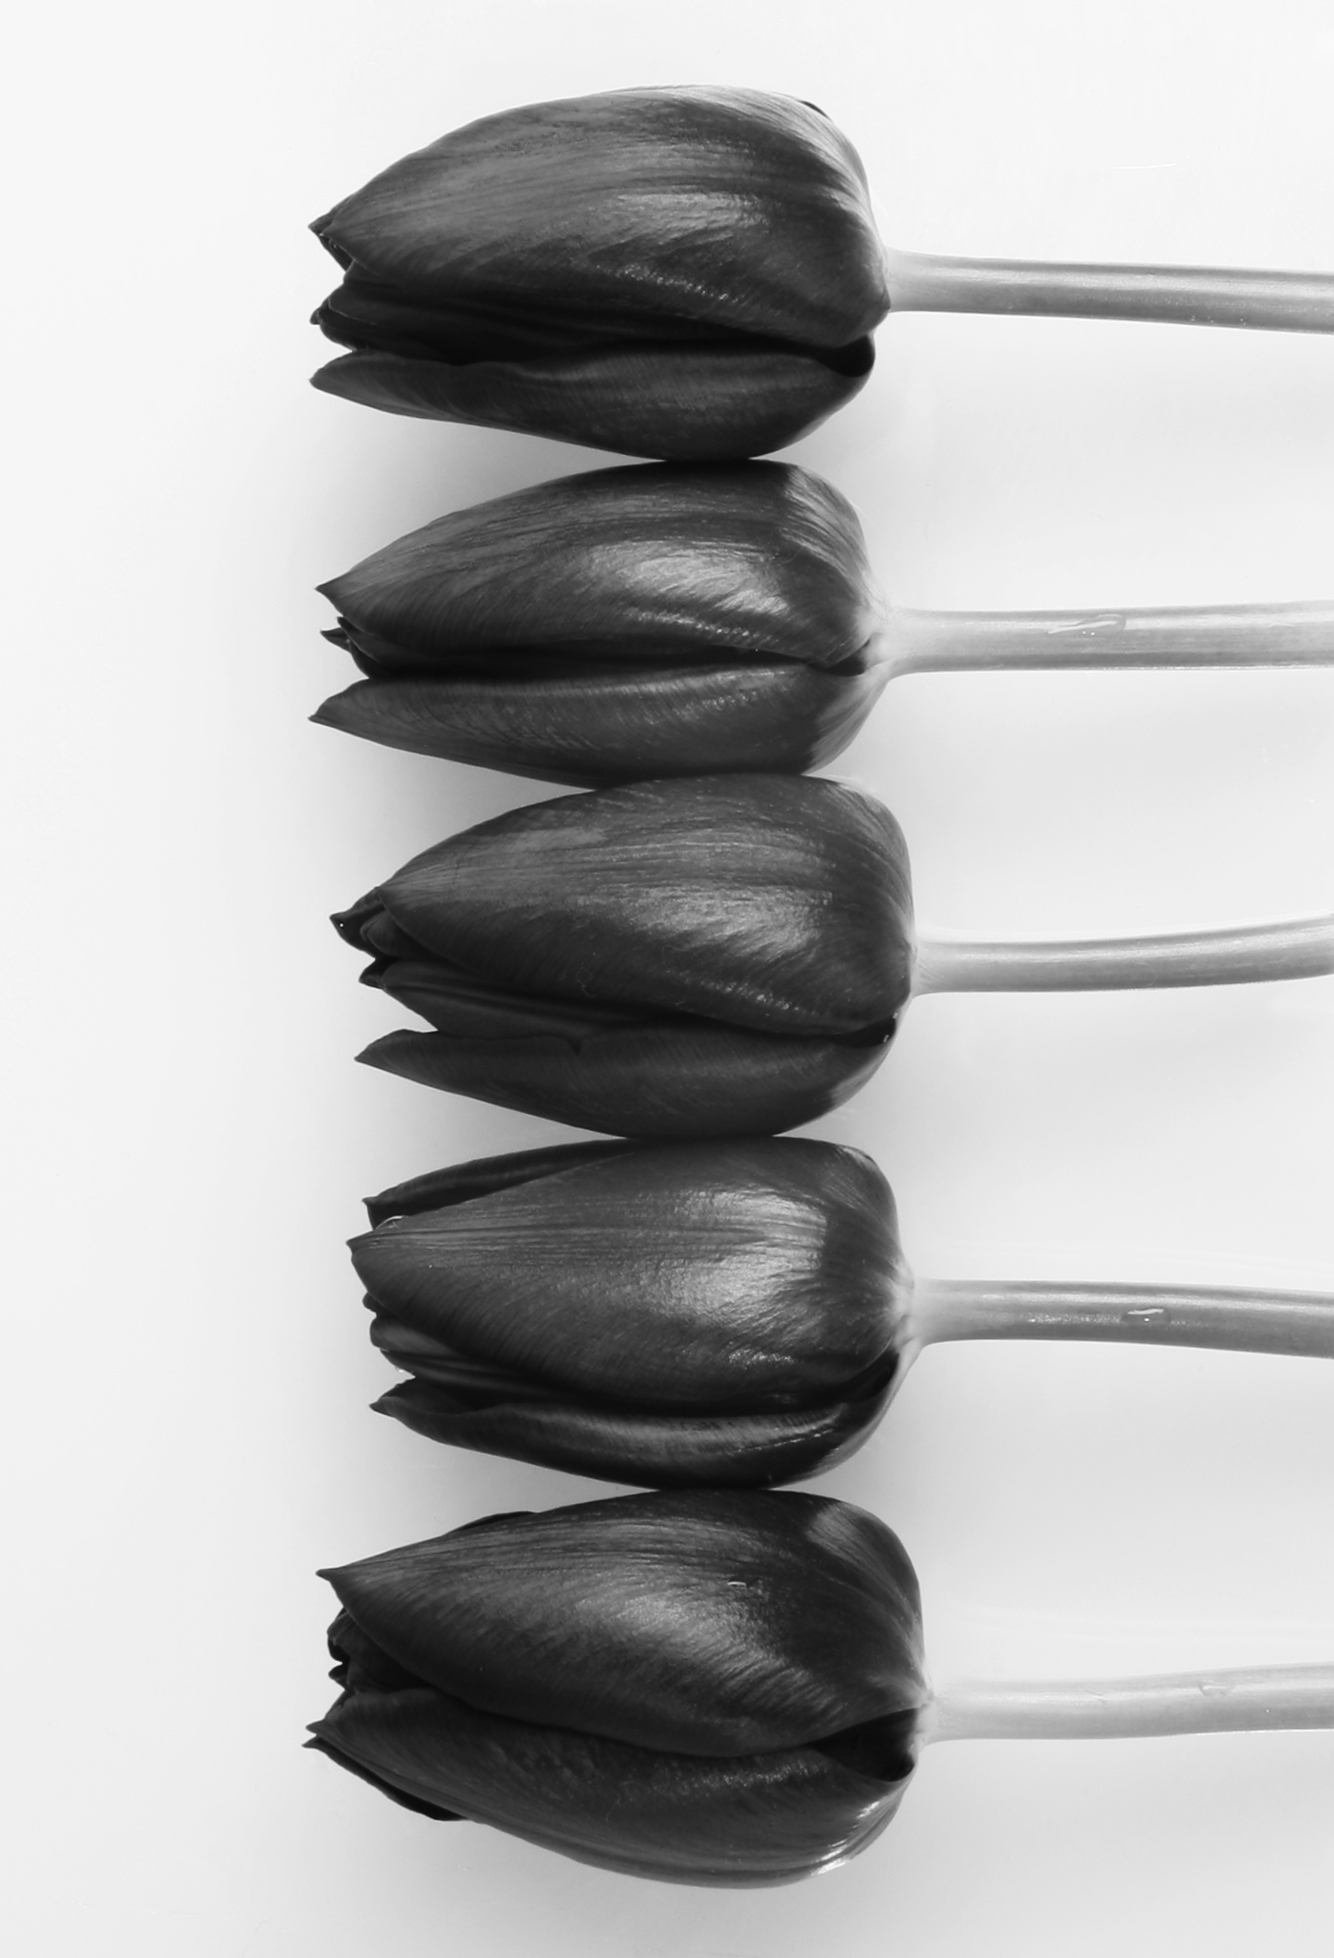 zwarte Hollandse tulpen